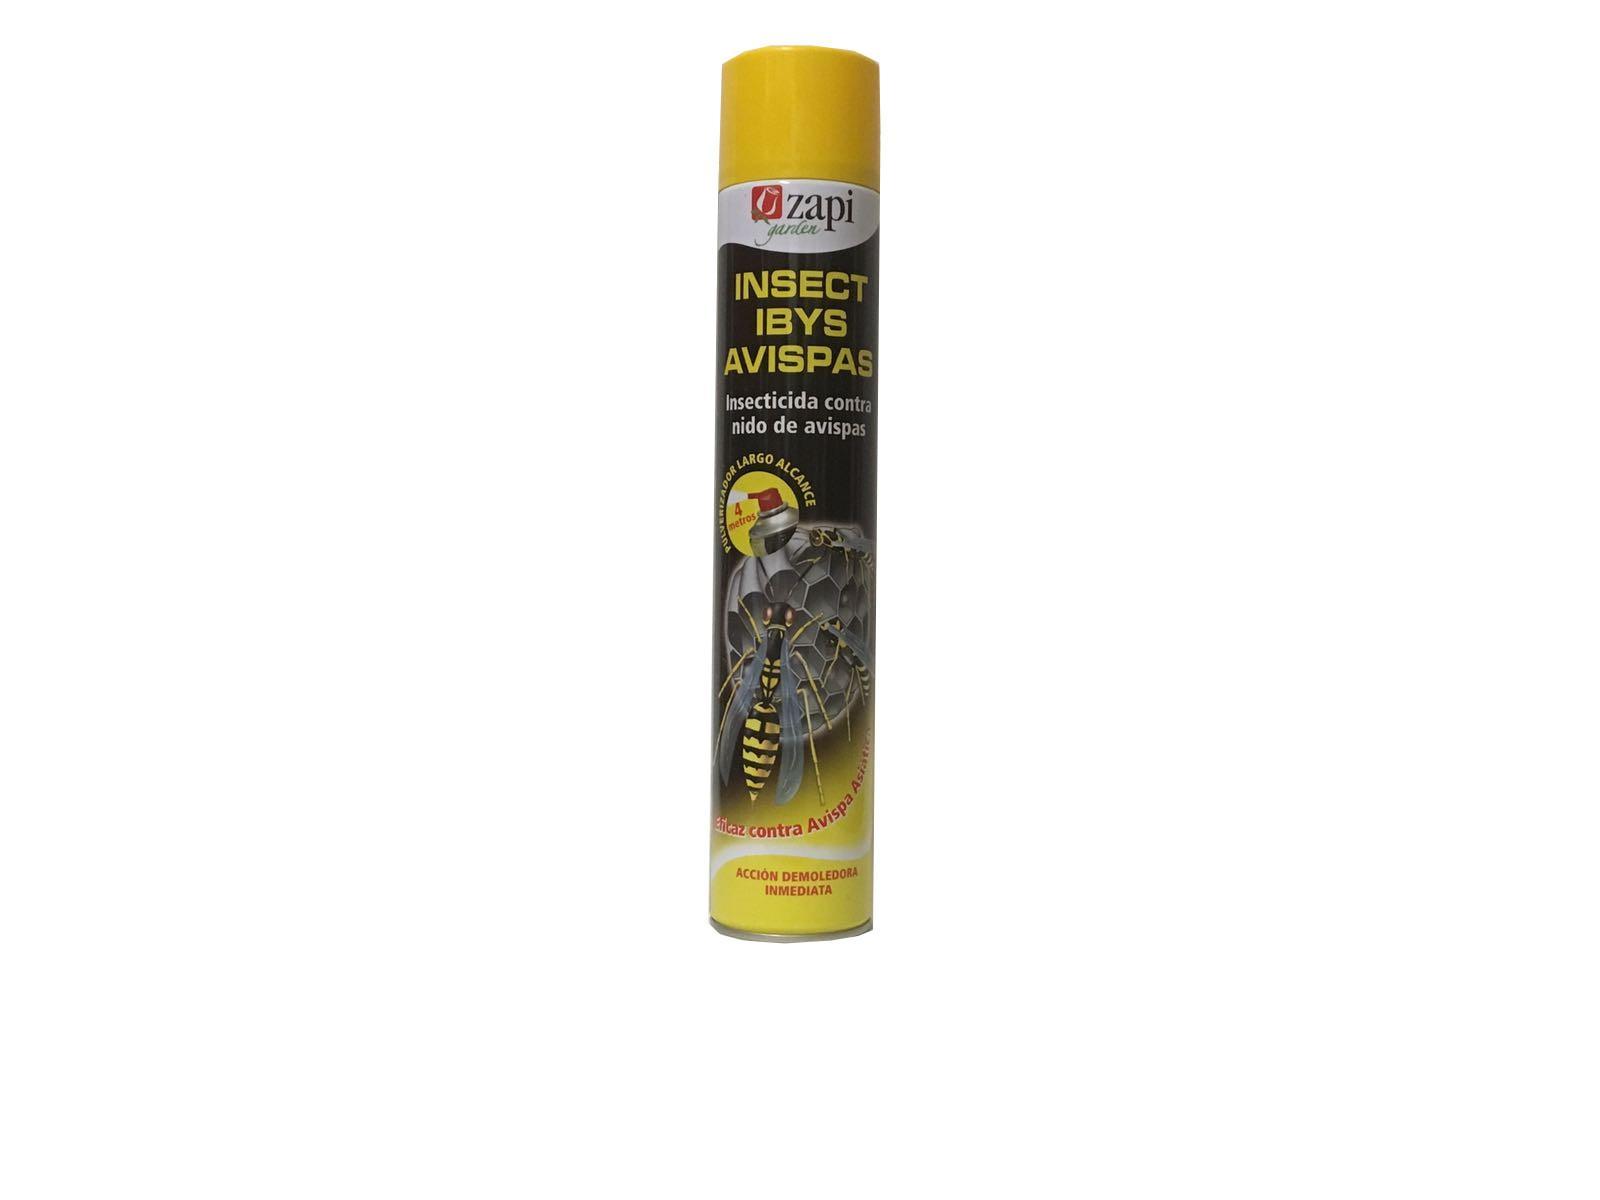 Insecticida Insect IBYS avispas 750ml (Avispa asiática y o velutina)